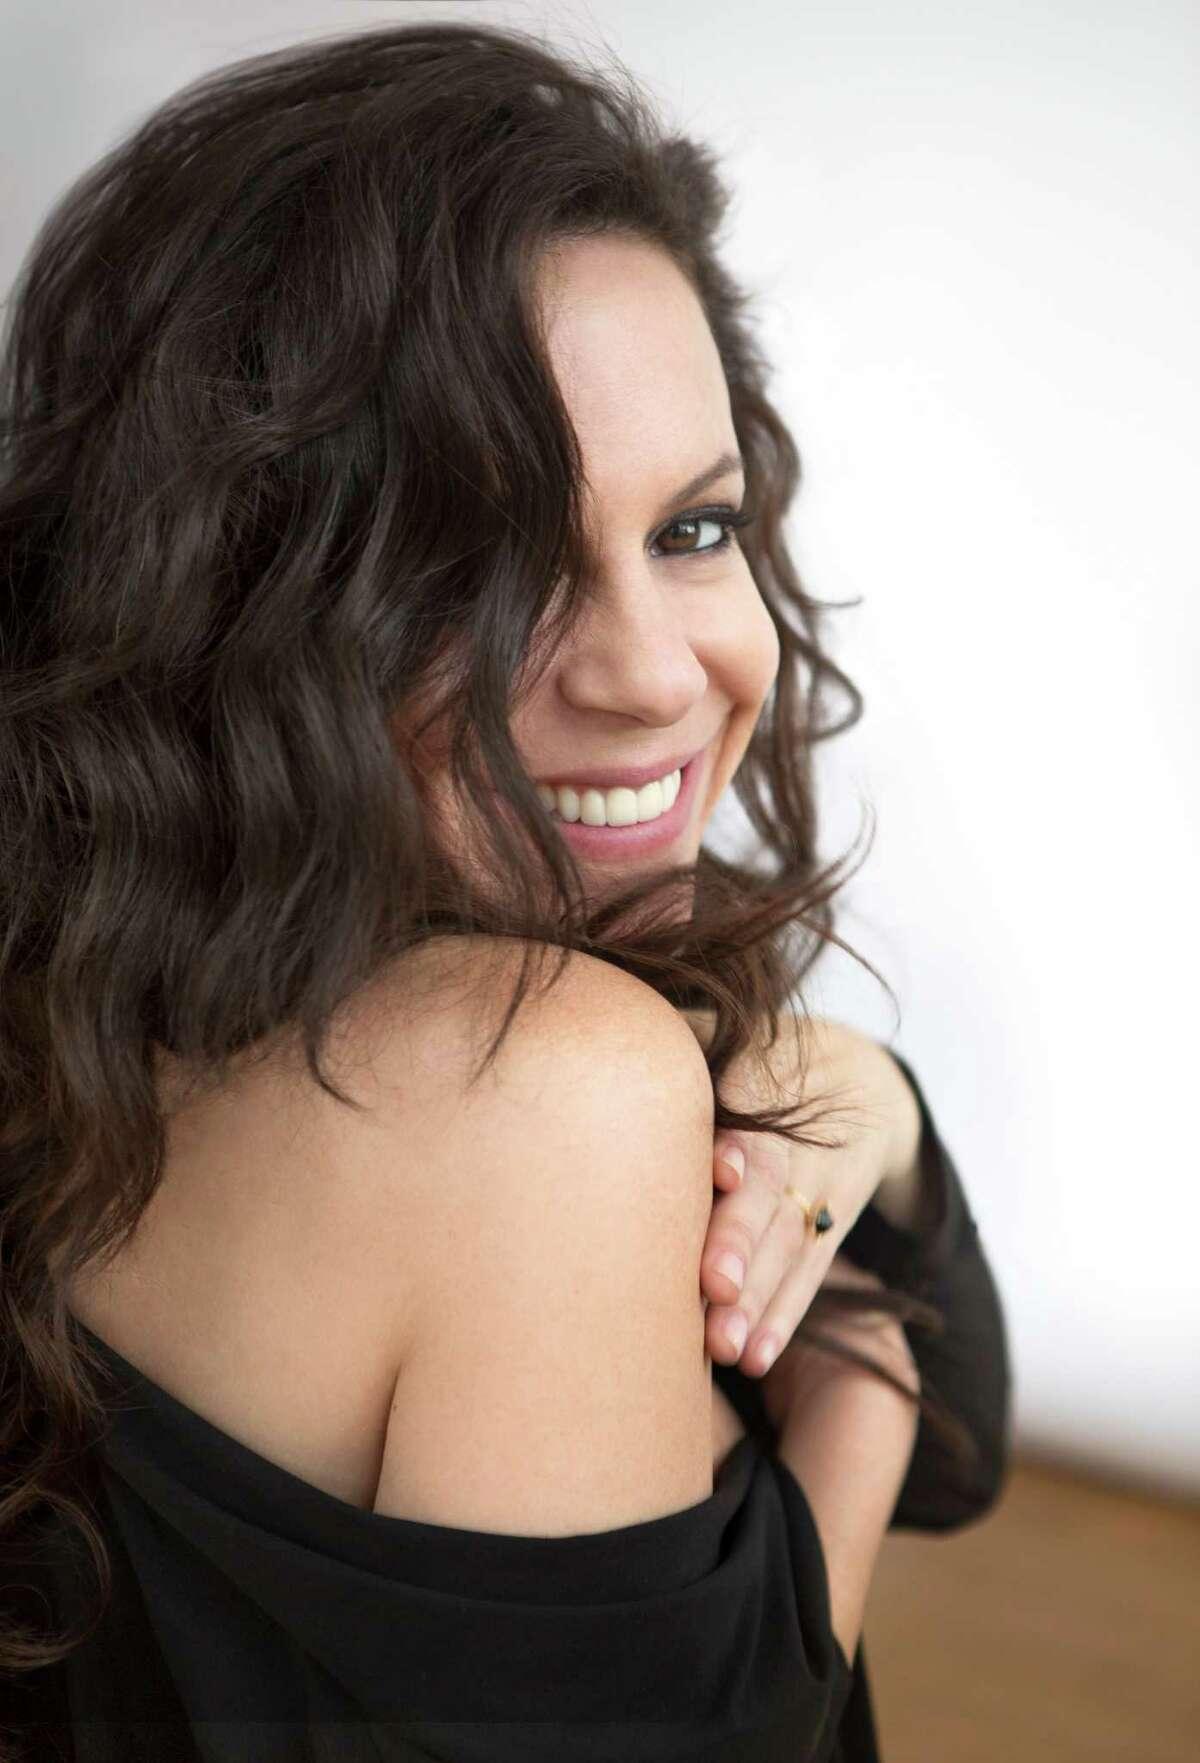 Grammy-nominated singer Bebel Gilberto will be in San Antonio on May 17.